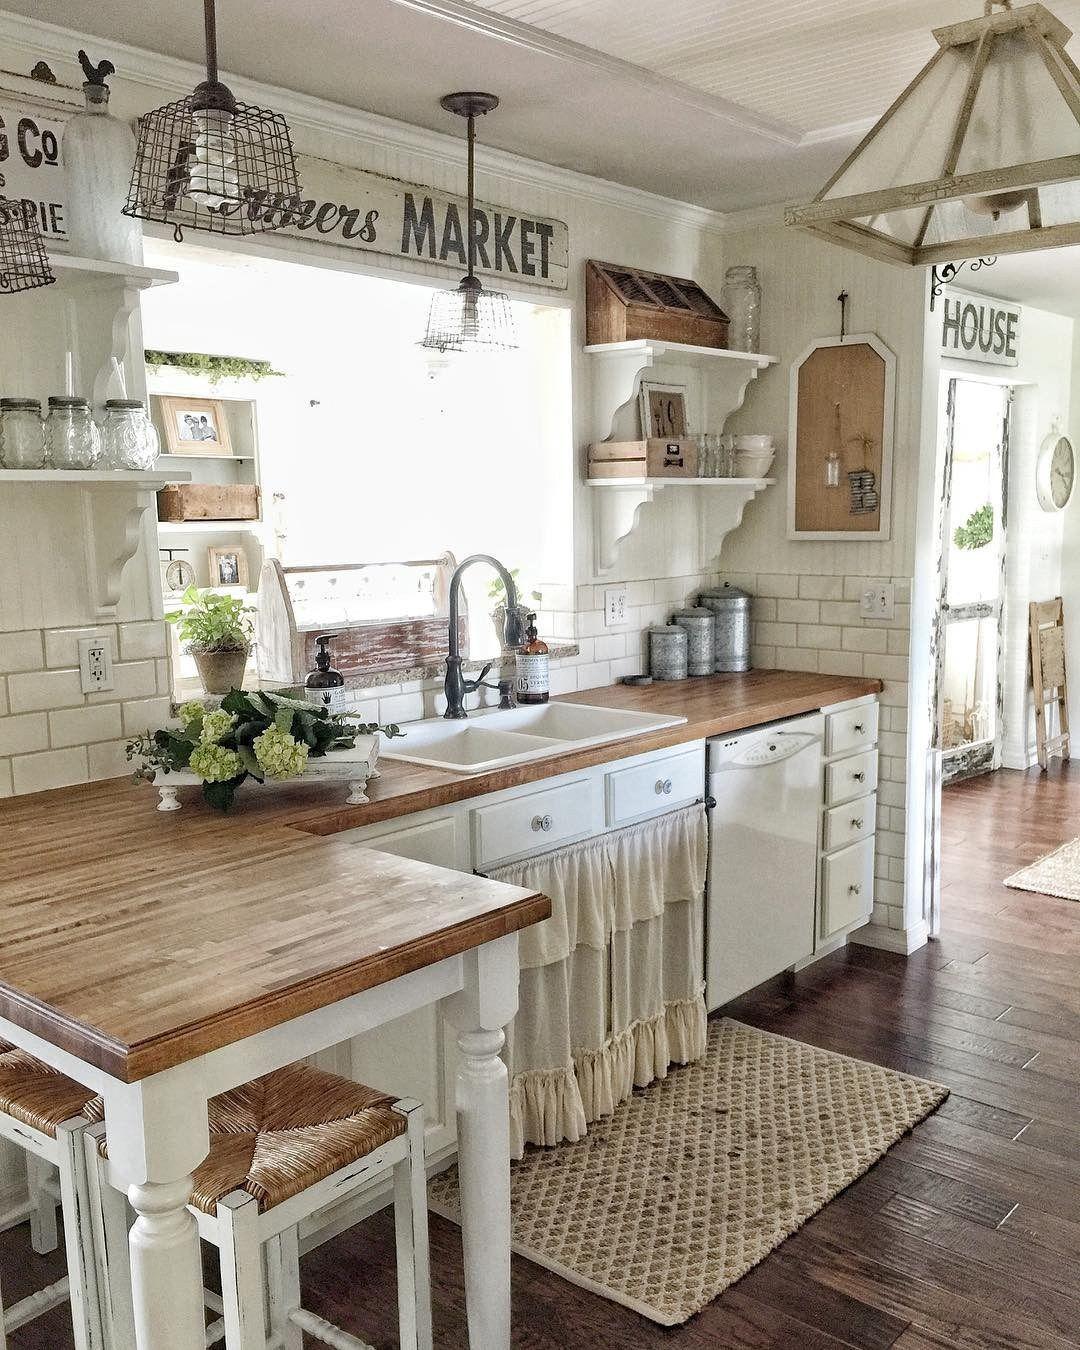 Farmhouse Kitchen Ideas On A Budget For 2017 (1 | Küche